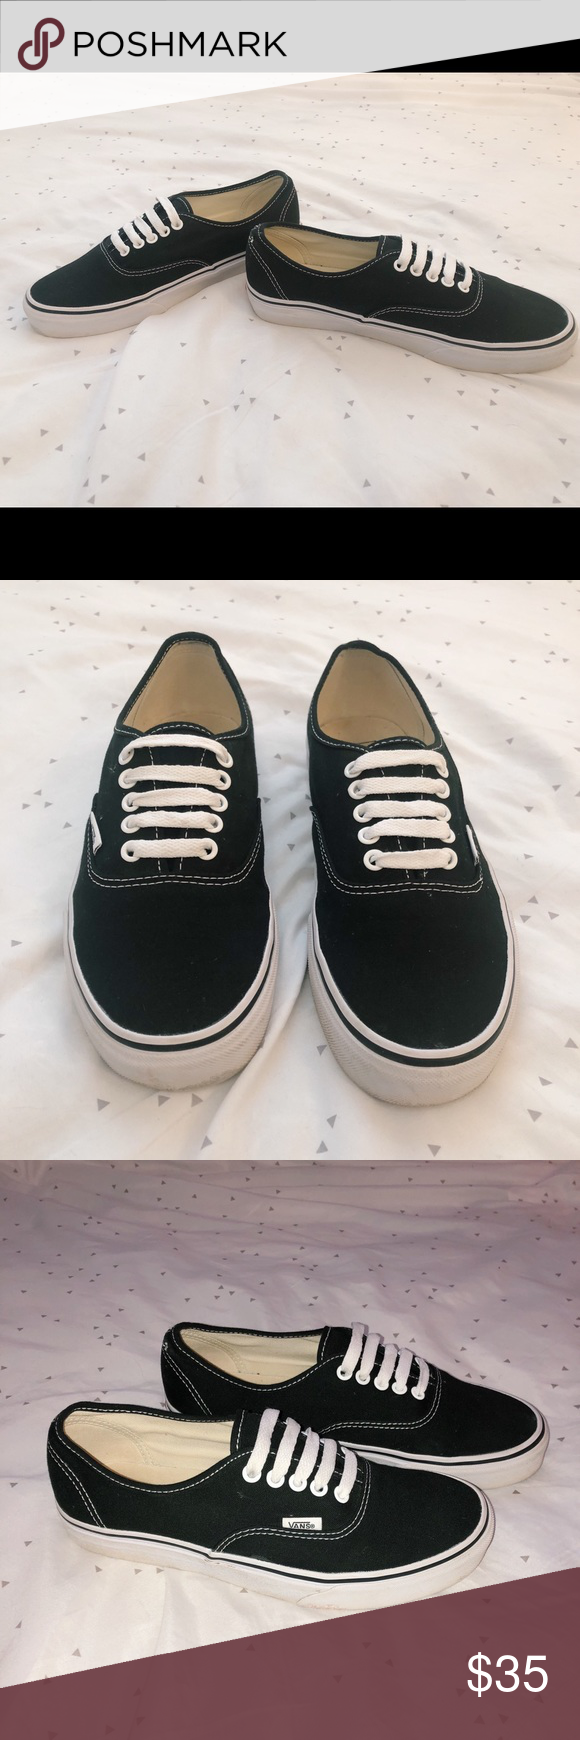 434a38c4fd Black Vans 🔹 Classic shoes